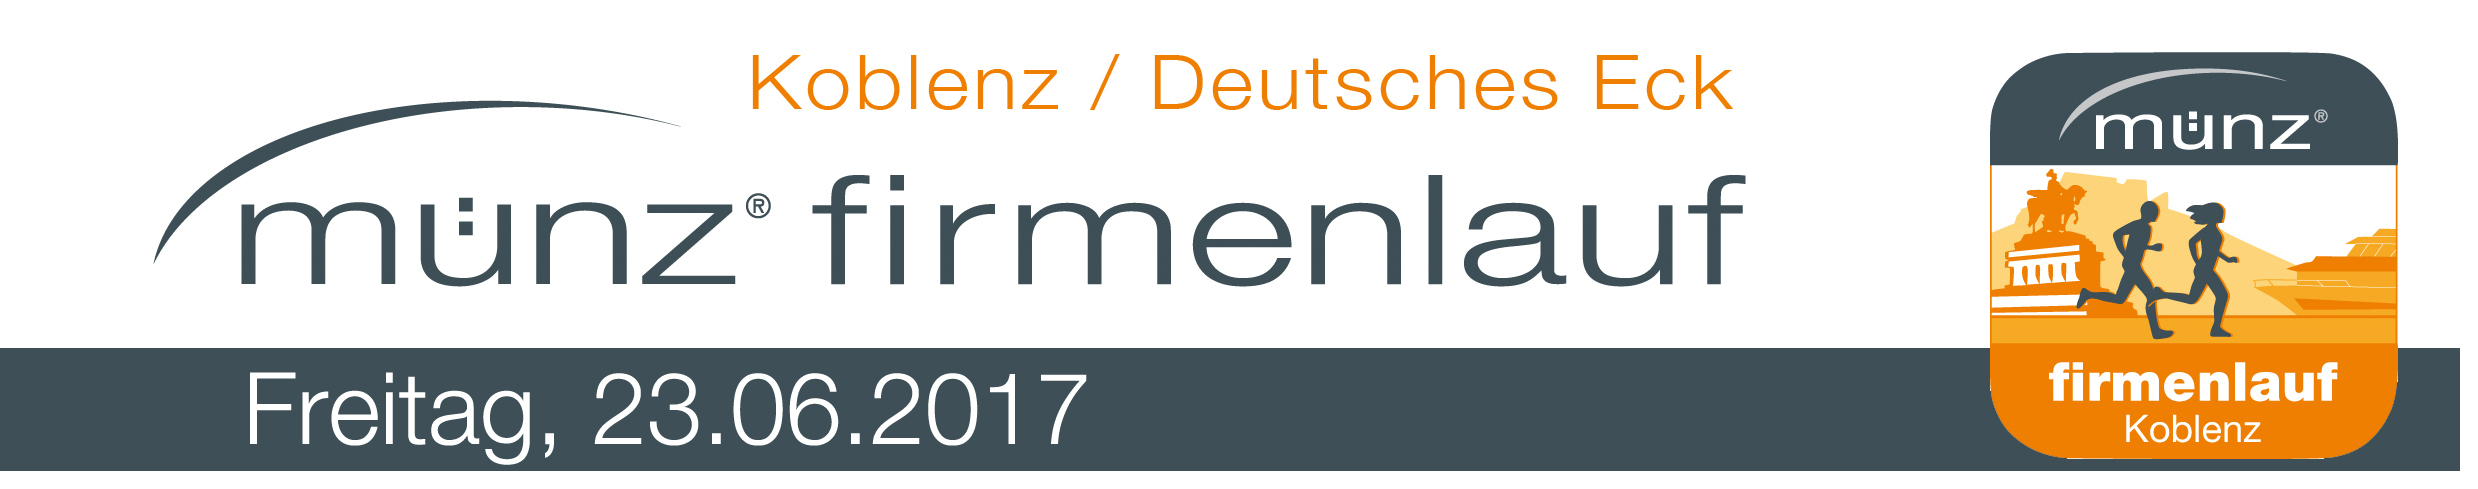 Myraceresult Münz Firmenlauf 2017 23062017